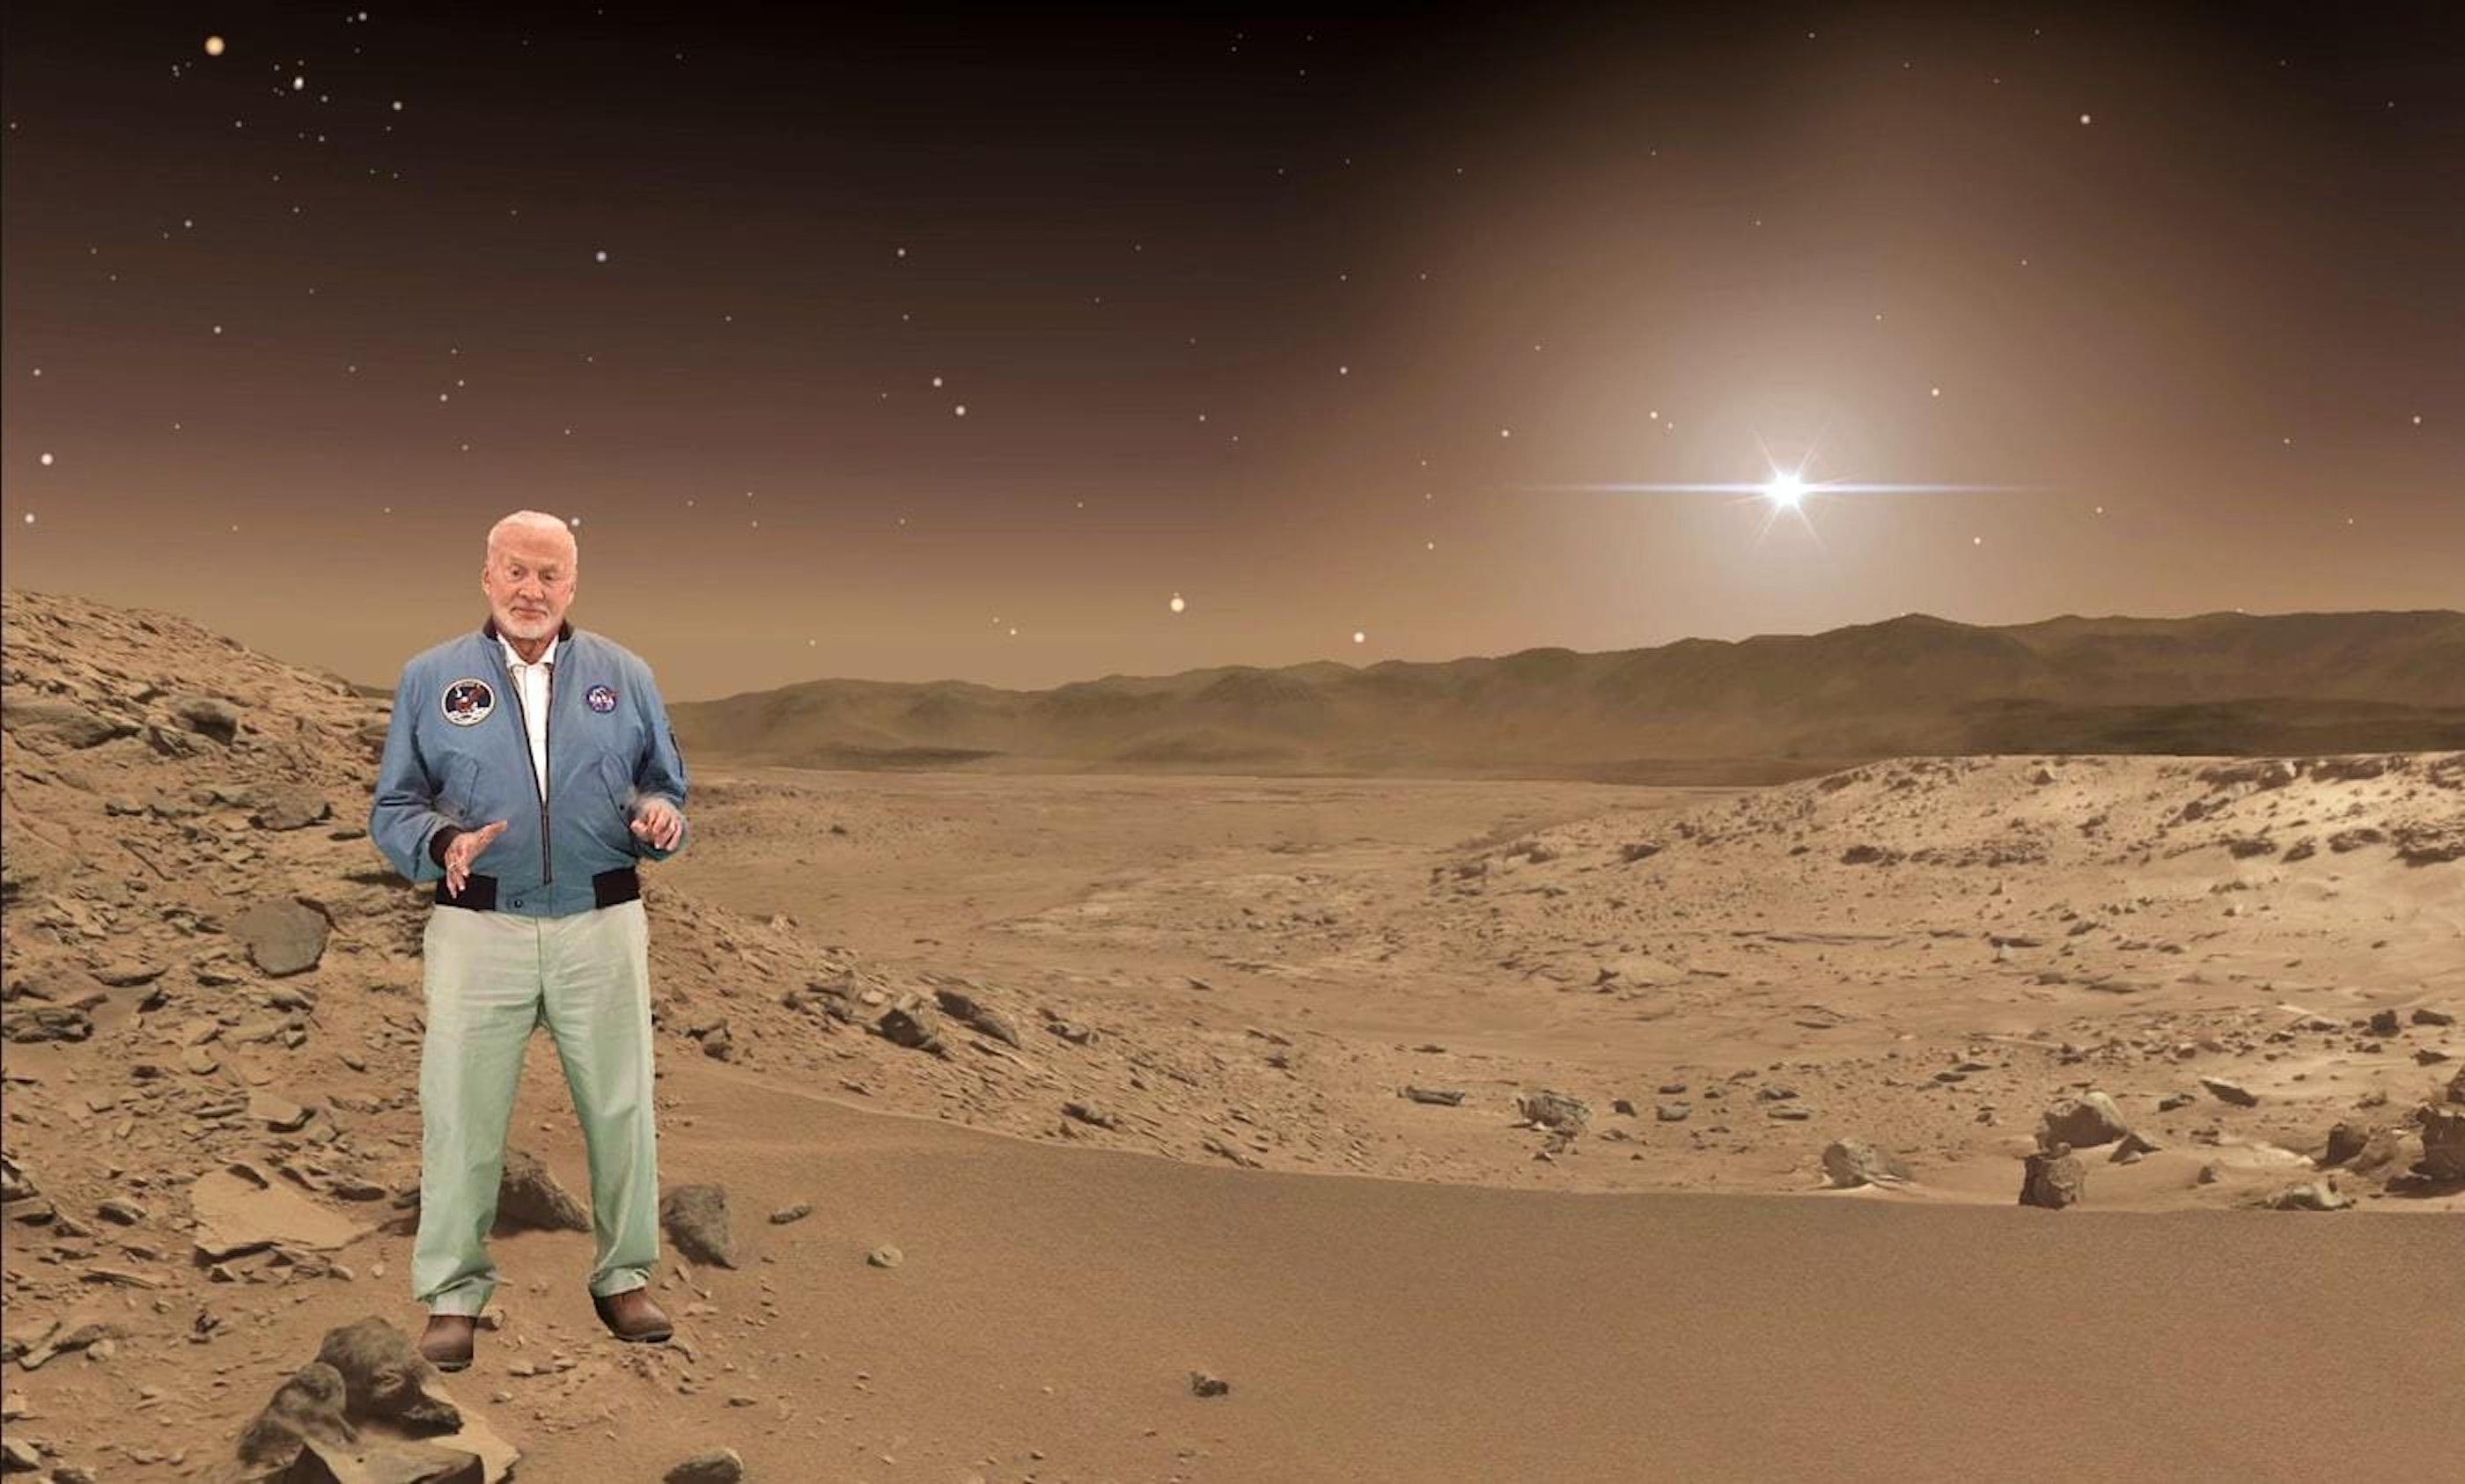 Buzz Aldrin ... on Mars!